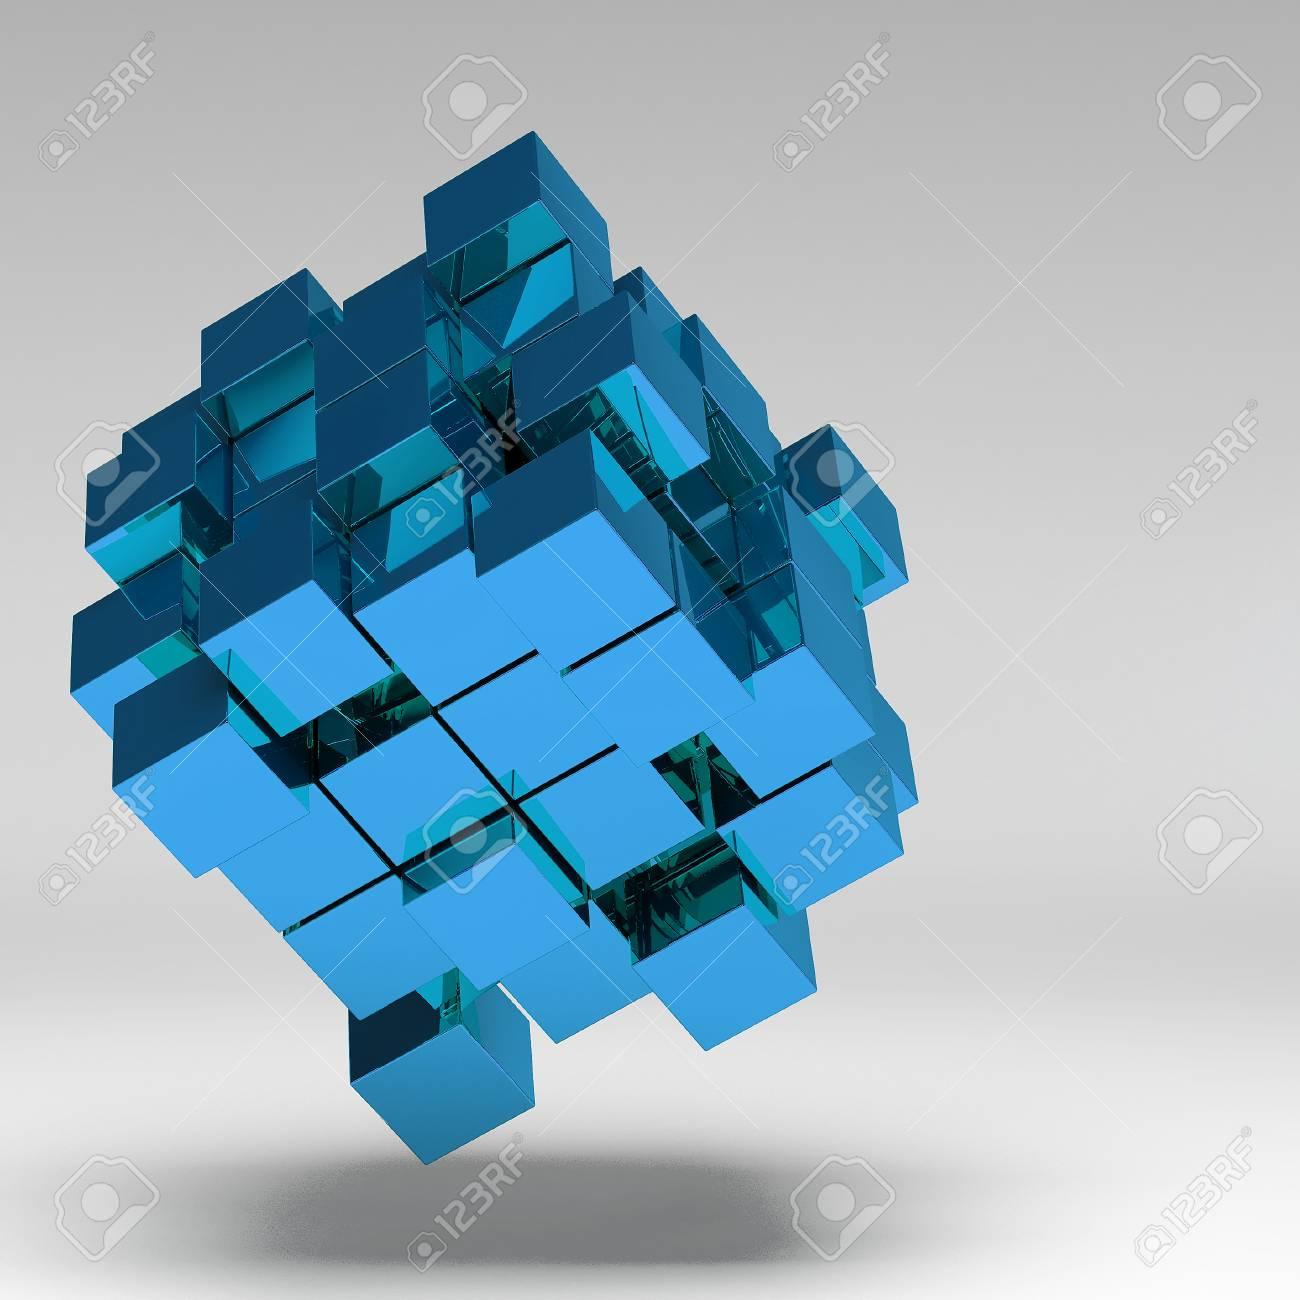 3d illustration basic geometric shapes Stock Illustration - 22521714